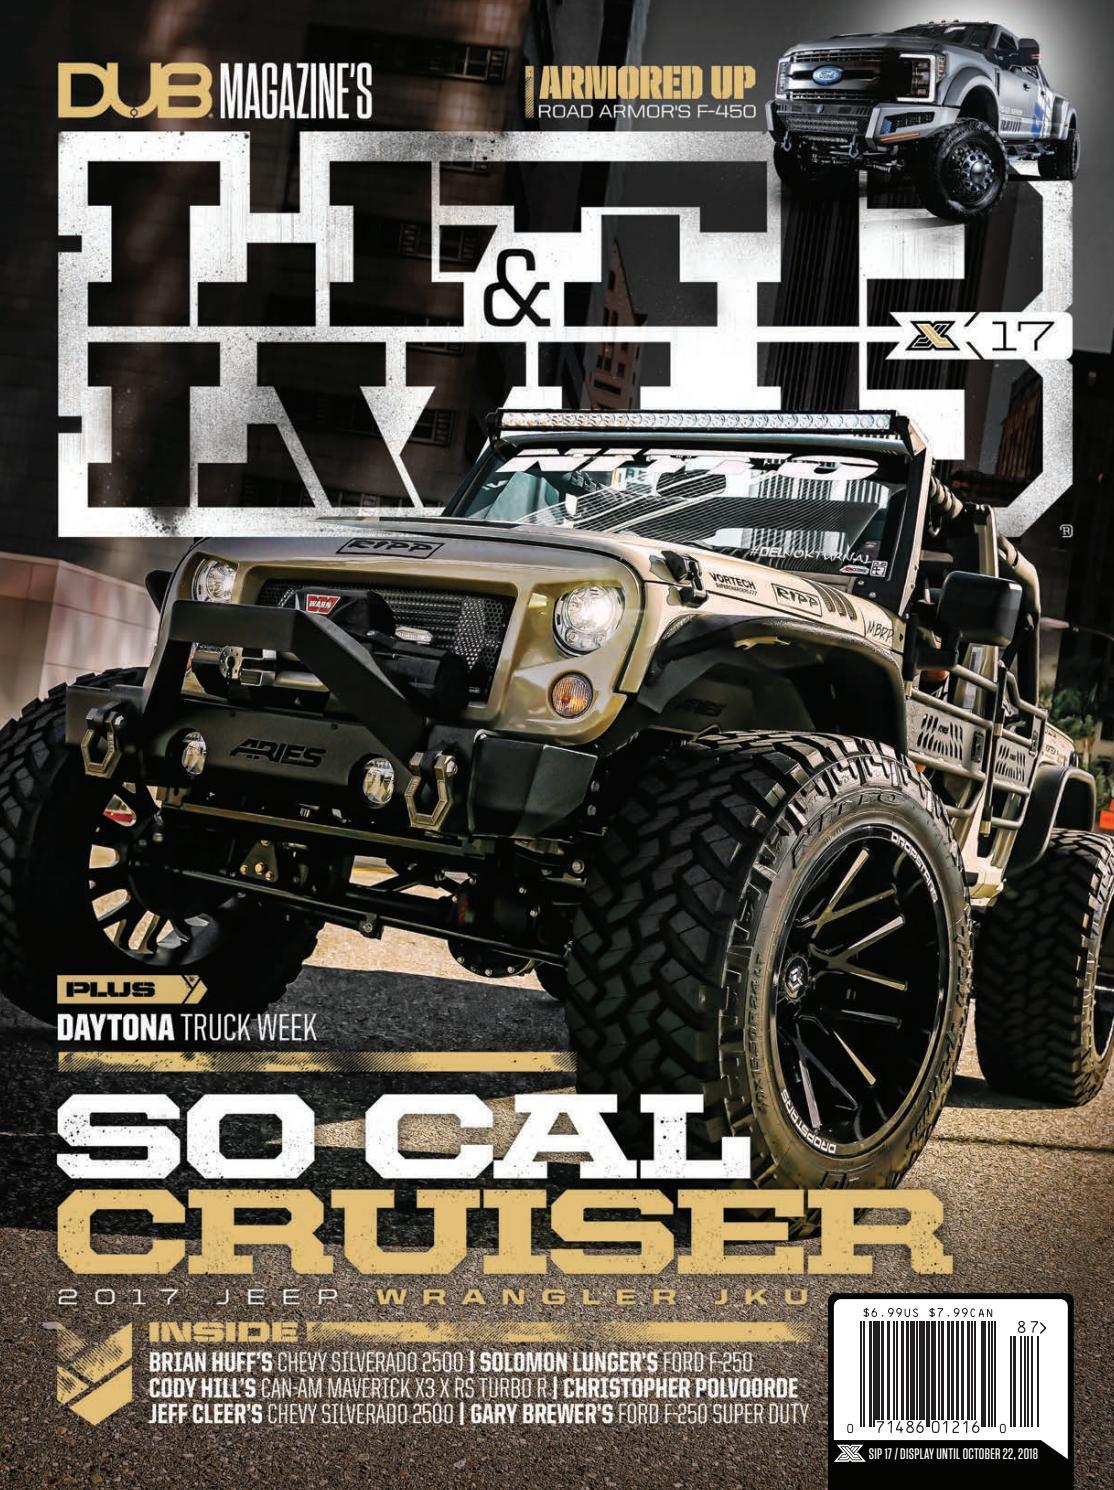 DUB Magazine's LFTD&LVLD, Issue 17 by DUB - issuu